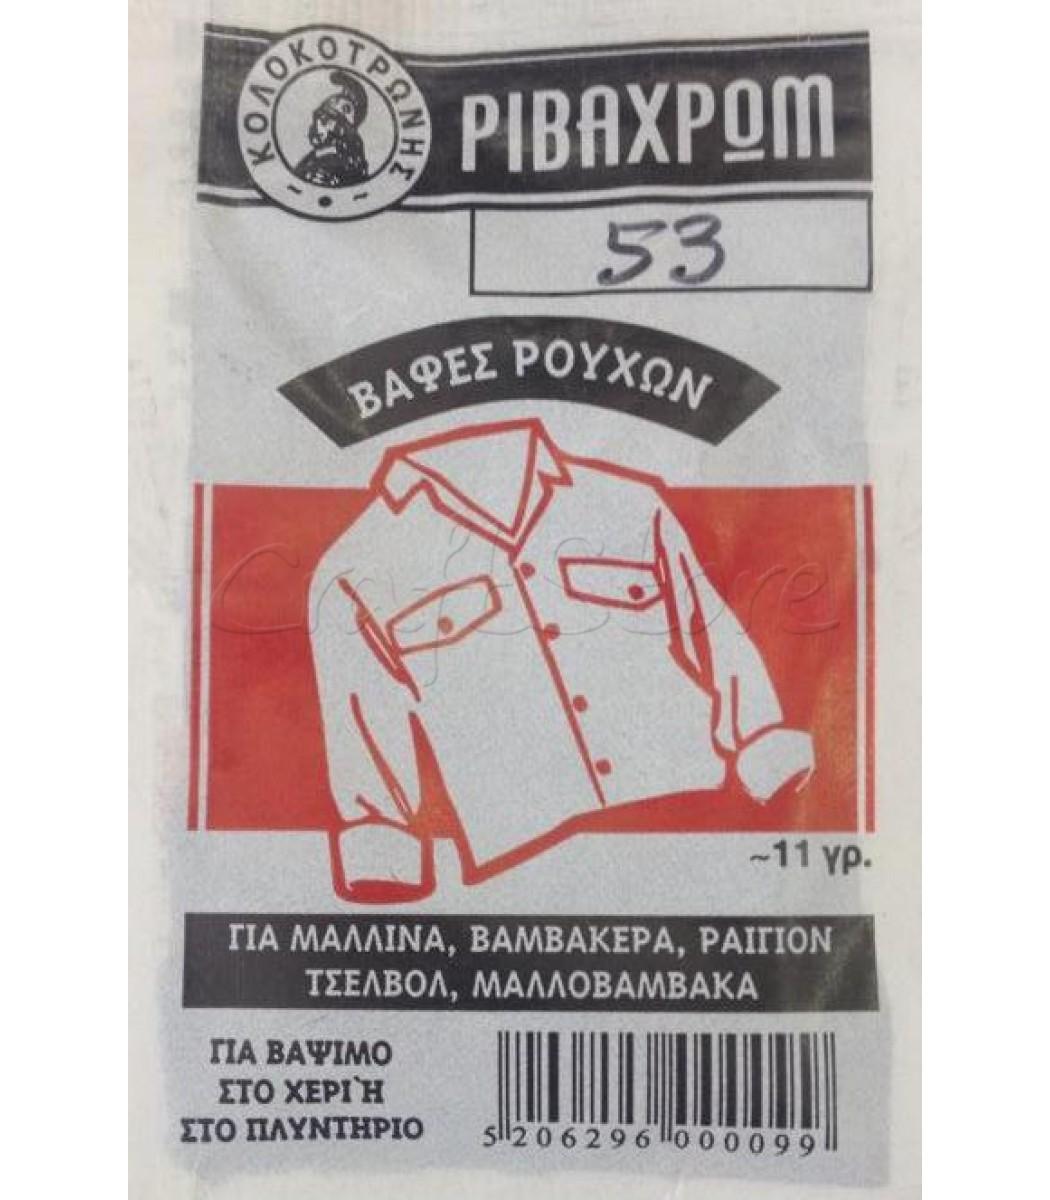 25b2aa11653 Βαφή ρούχων Ριβαχρώμ | Craftstore.gr